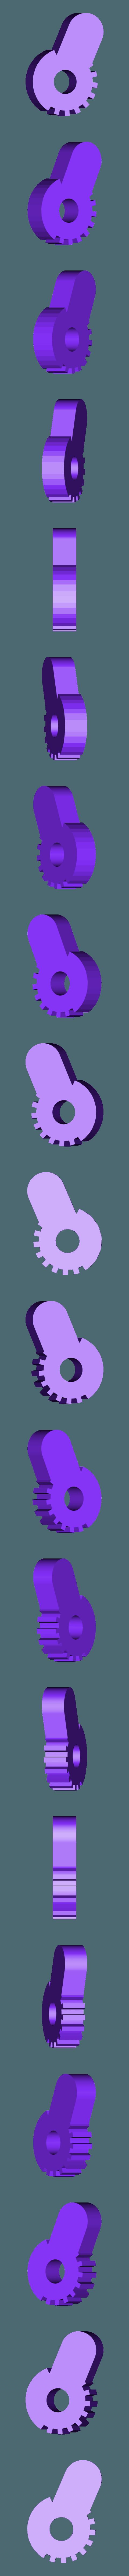 FrontLeft.stl Download free STL file Funky turtle keychain • 3D print design, DK7